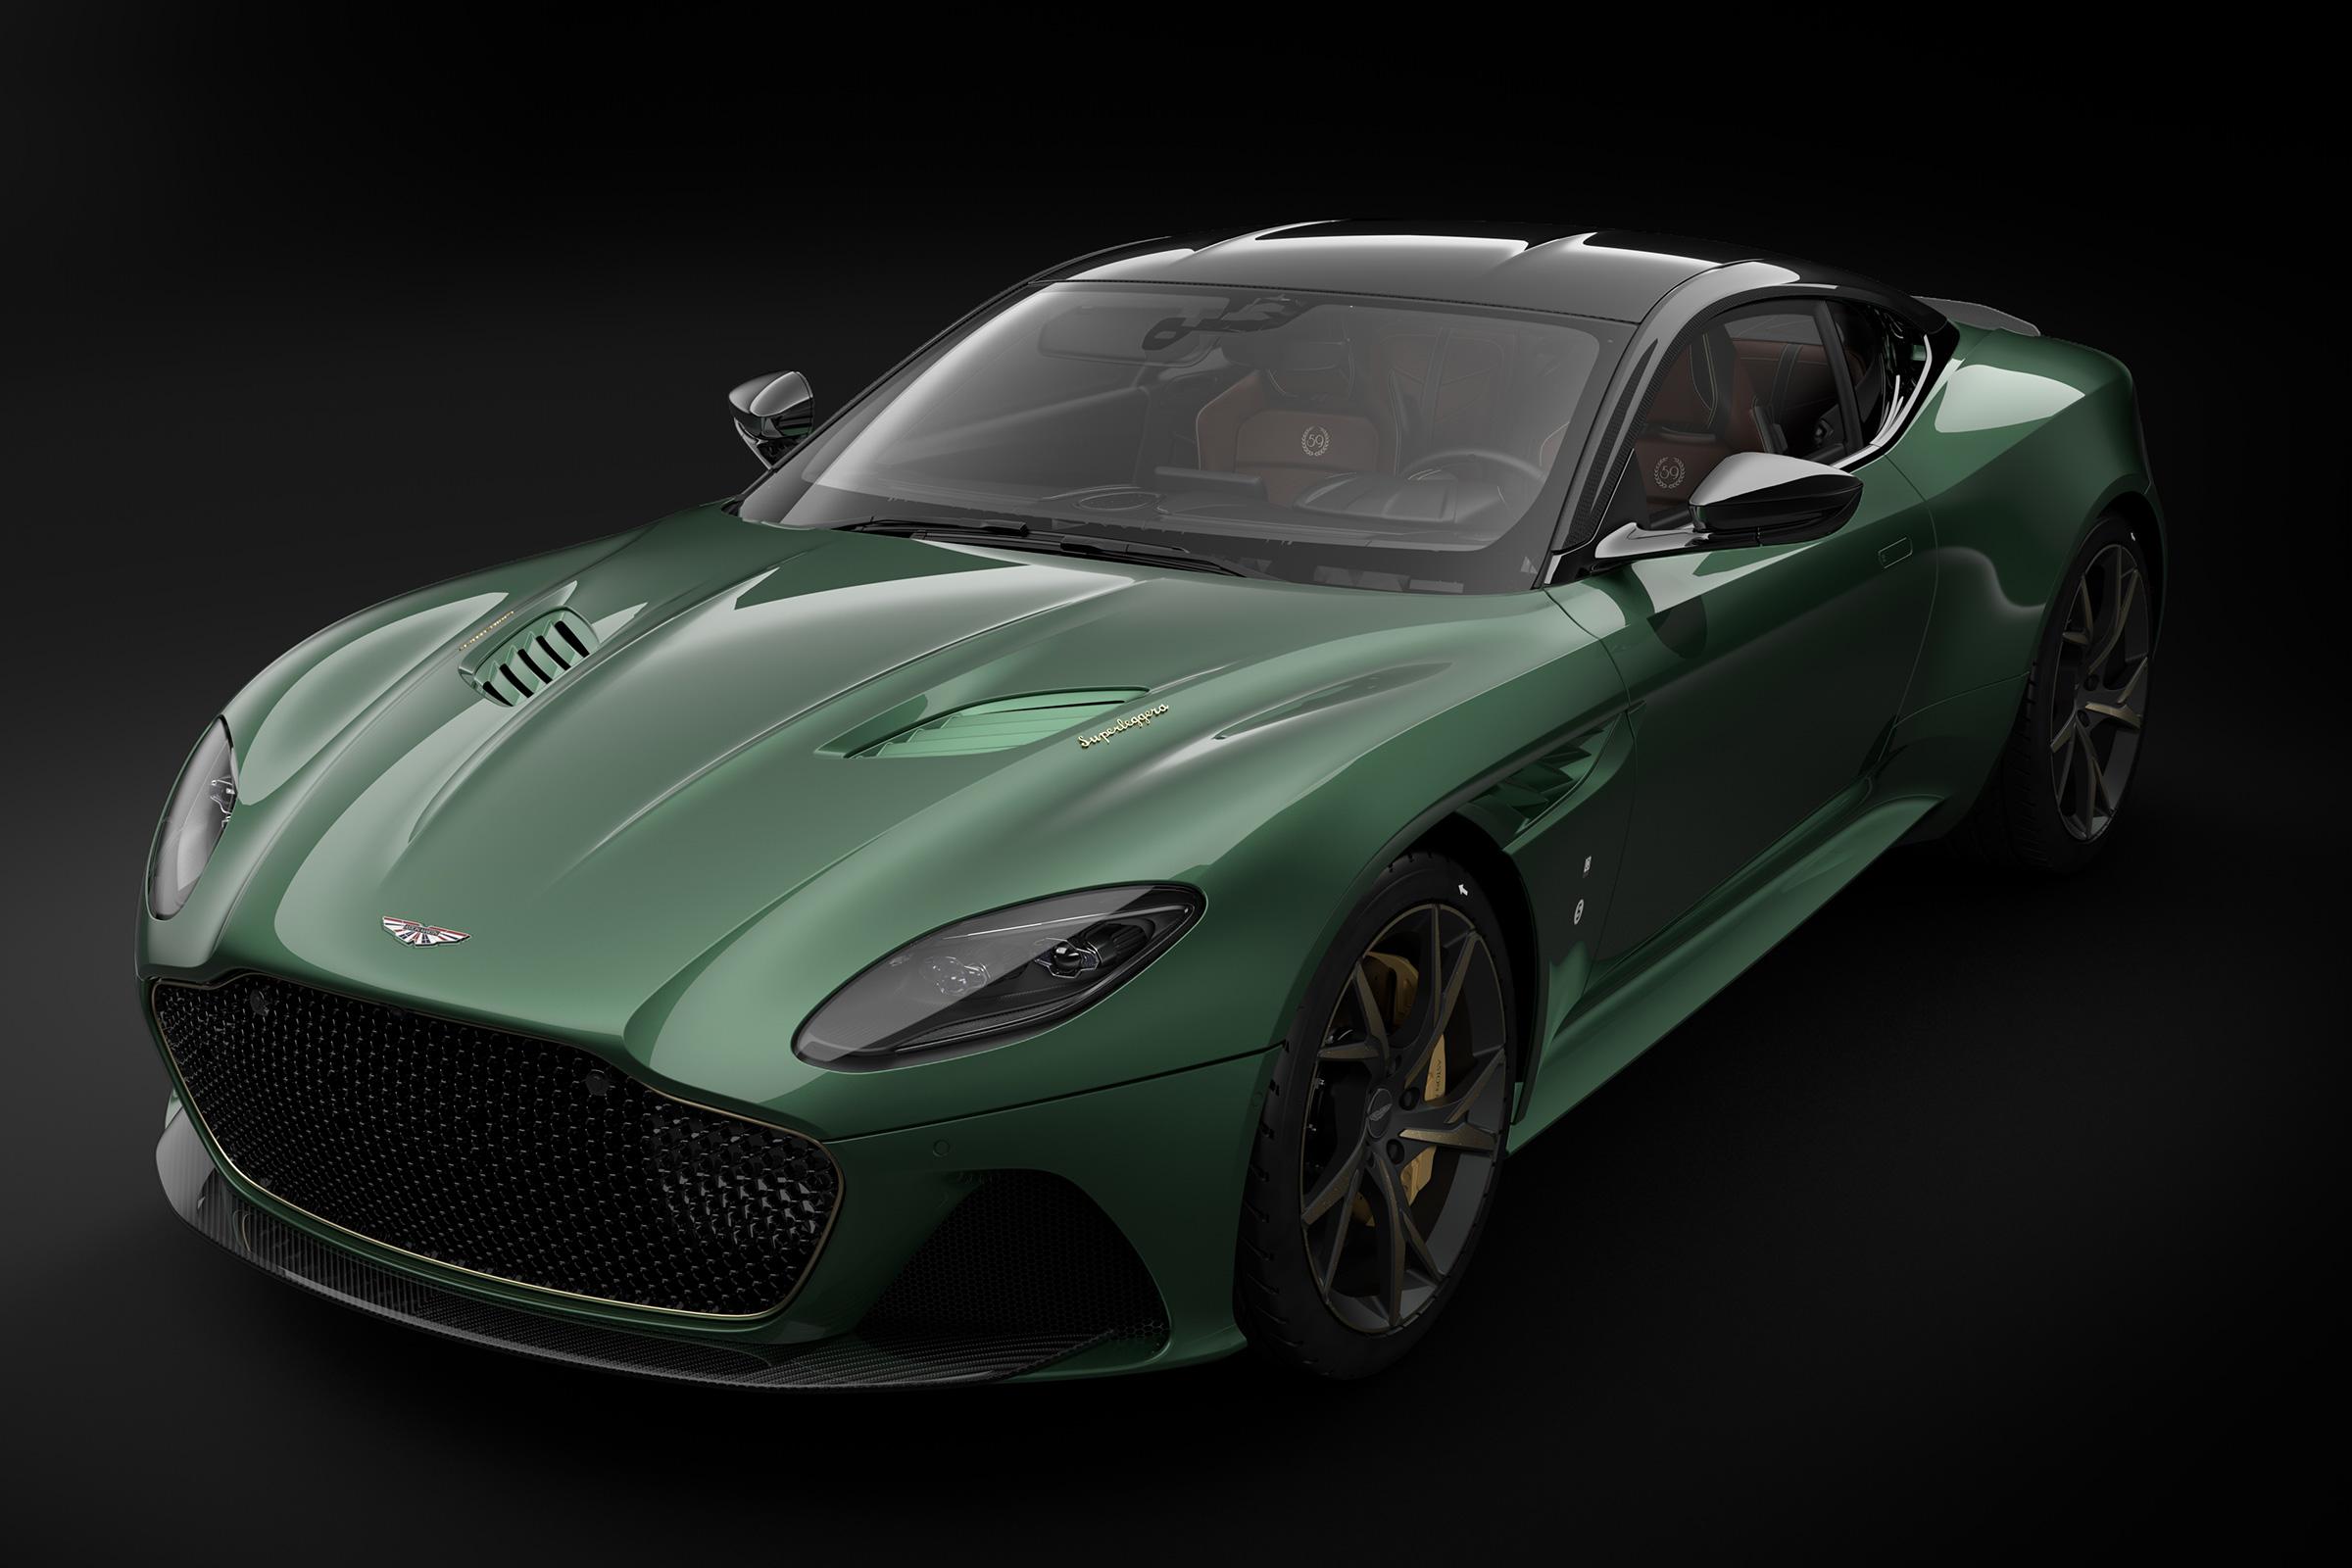 Aston Martin Dbs 59 Special Edition Celebrates Famous Le Mans Win Auto Express